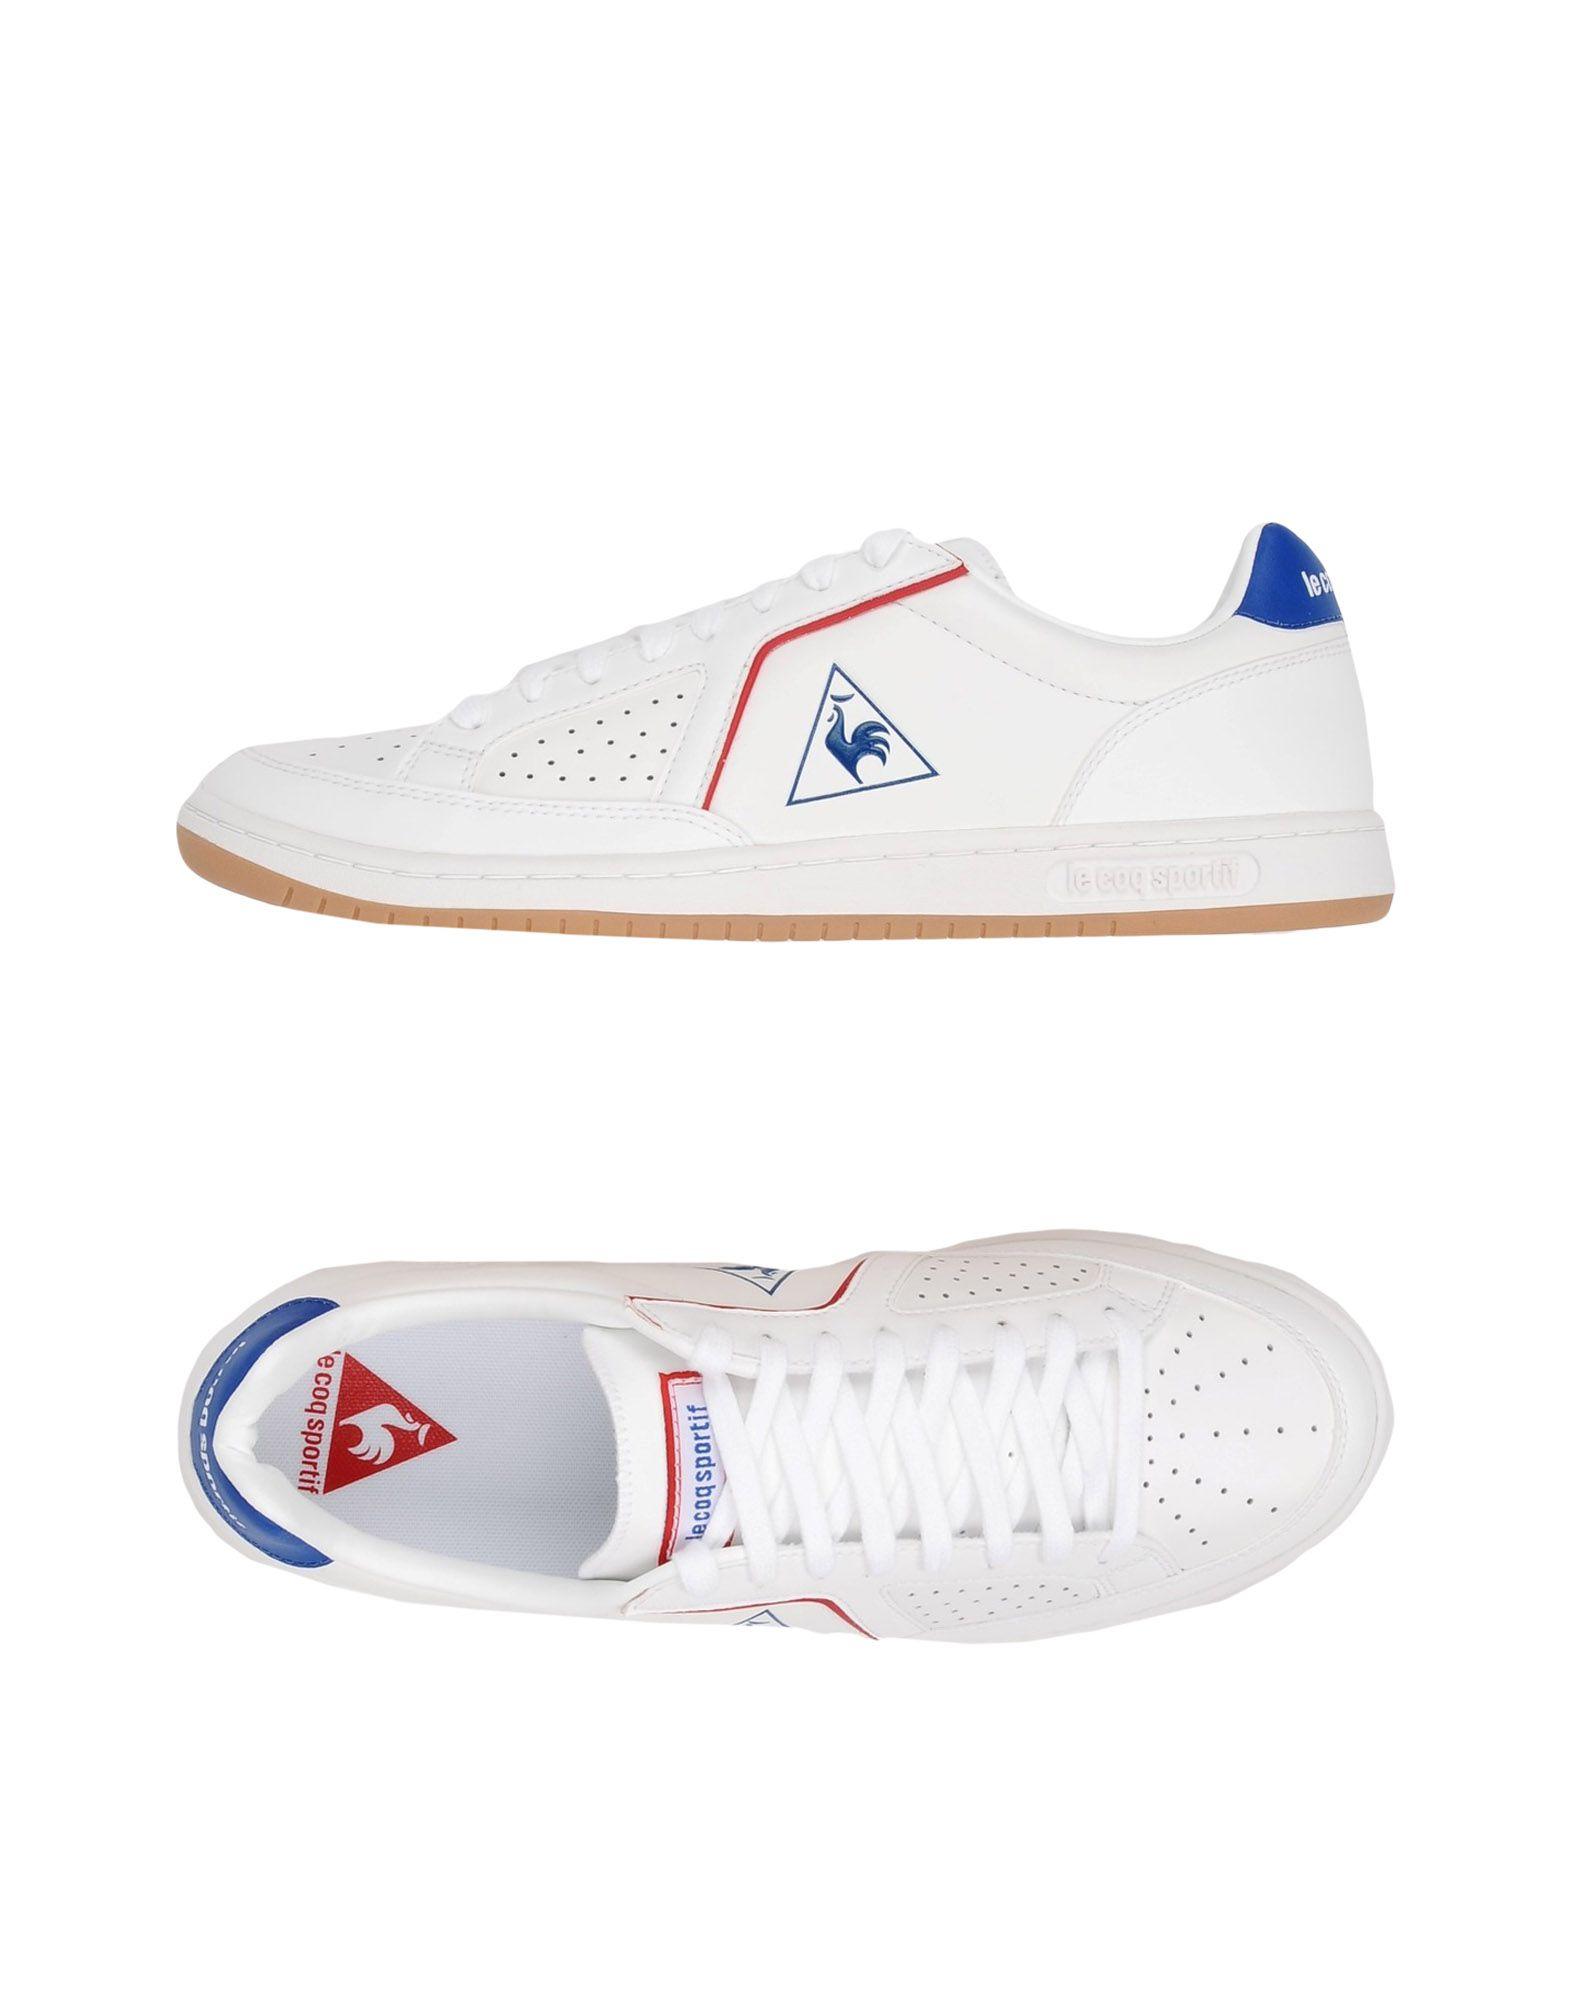 Le Coq Sportif Icons Lea Sport Gum  11302827NG Heiße Schuhe